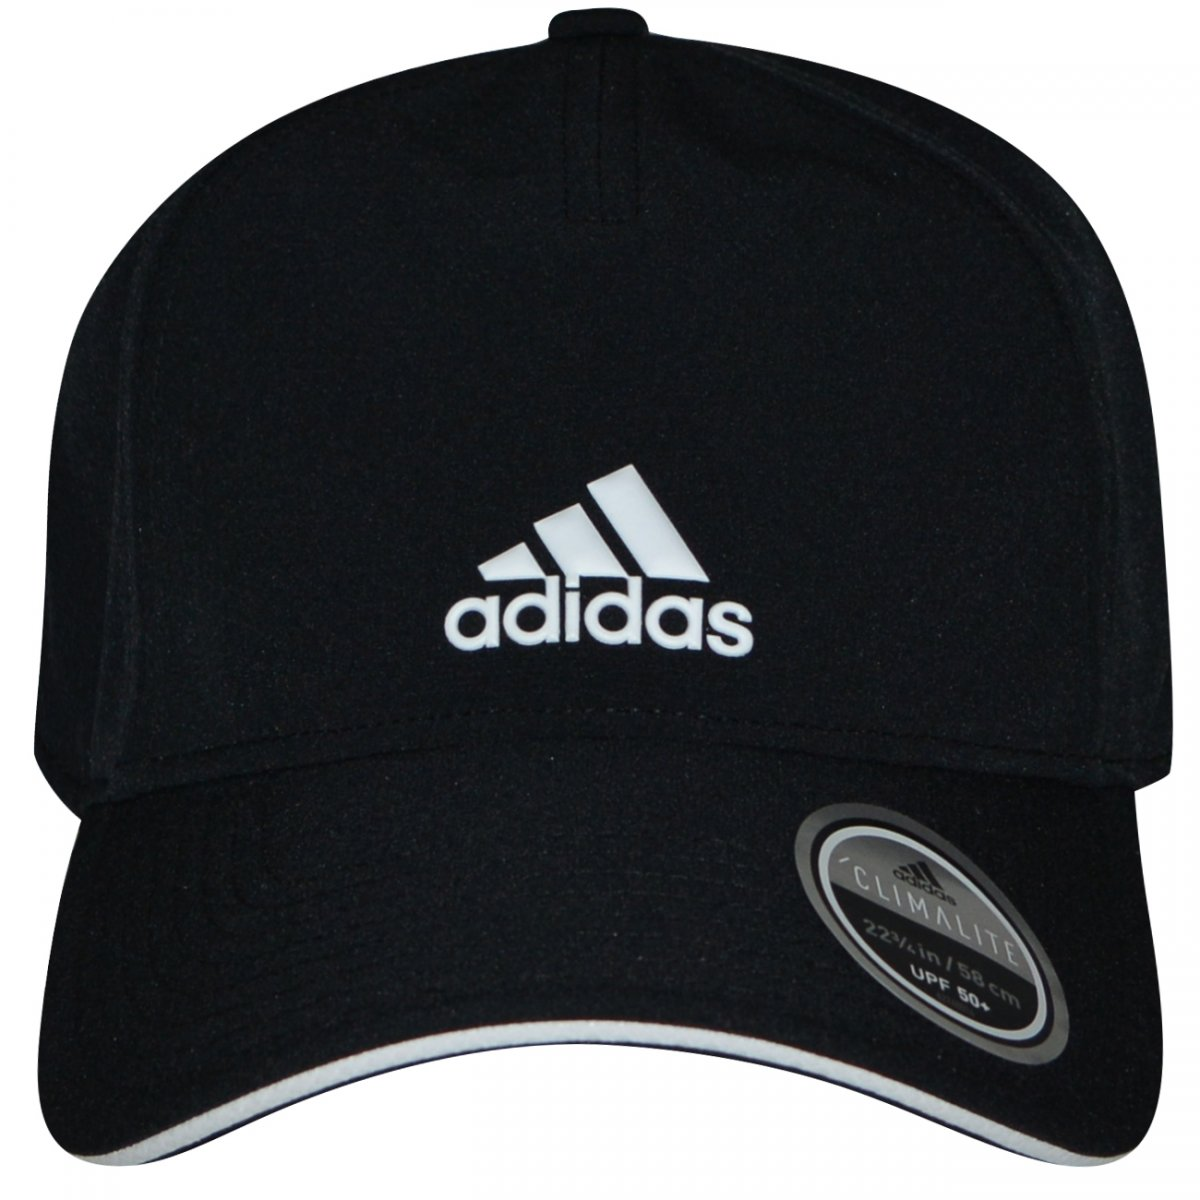 Bone Adidas C40 5P Clmlt Cap CG1781 - Preto branco - Chuteira Nike ... 78186584c5c